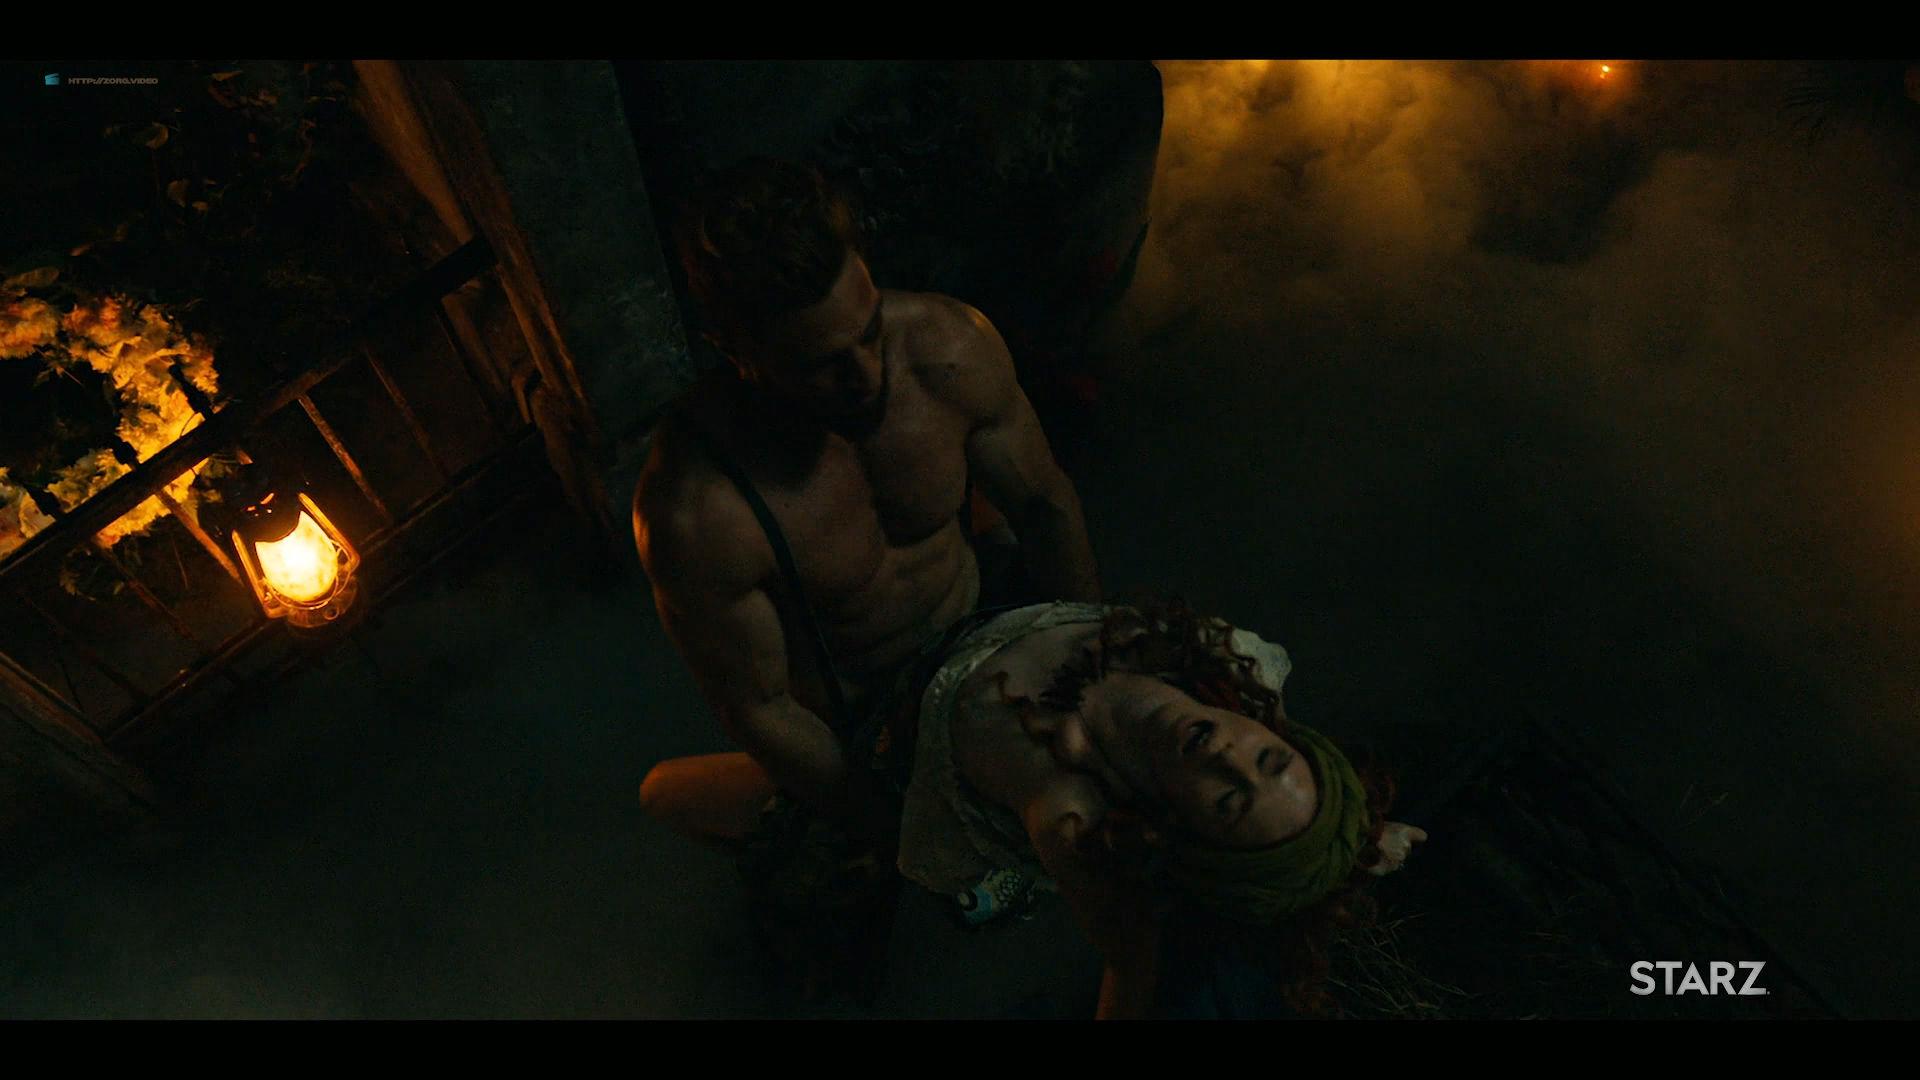 Emily Browning nude hot sex Hani Furstenberg nude sex too - American Gods (2019) s2e5 HD 1080p (6)